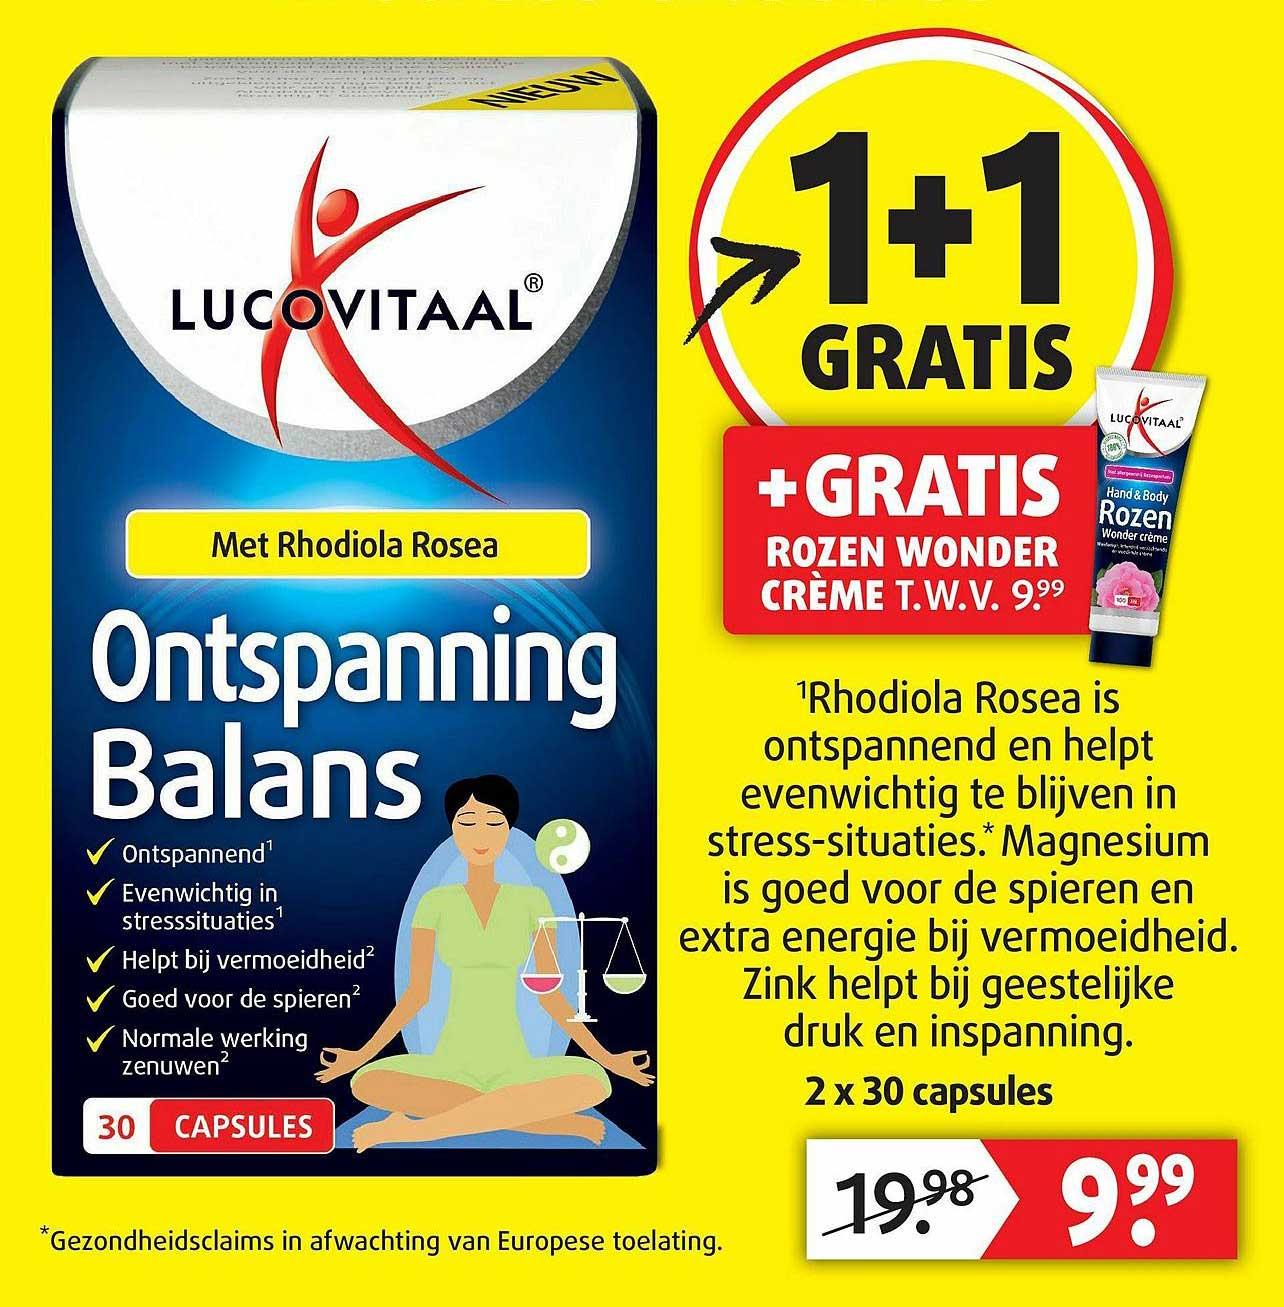 Lucovitaal Lucovitaal Ontspanning Balans 1+1 Gratis